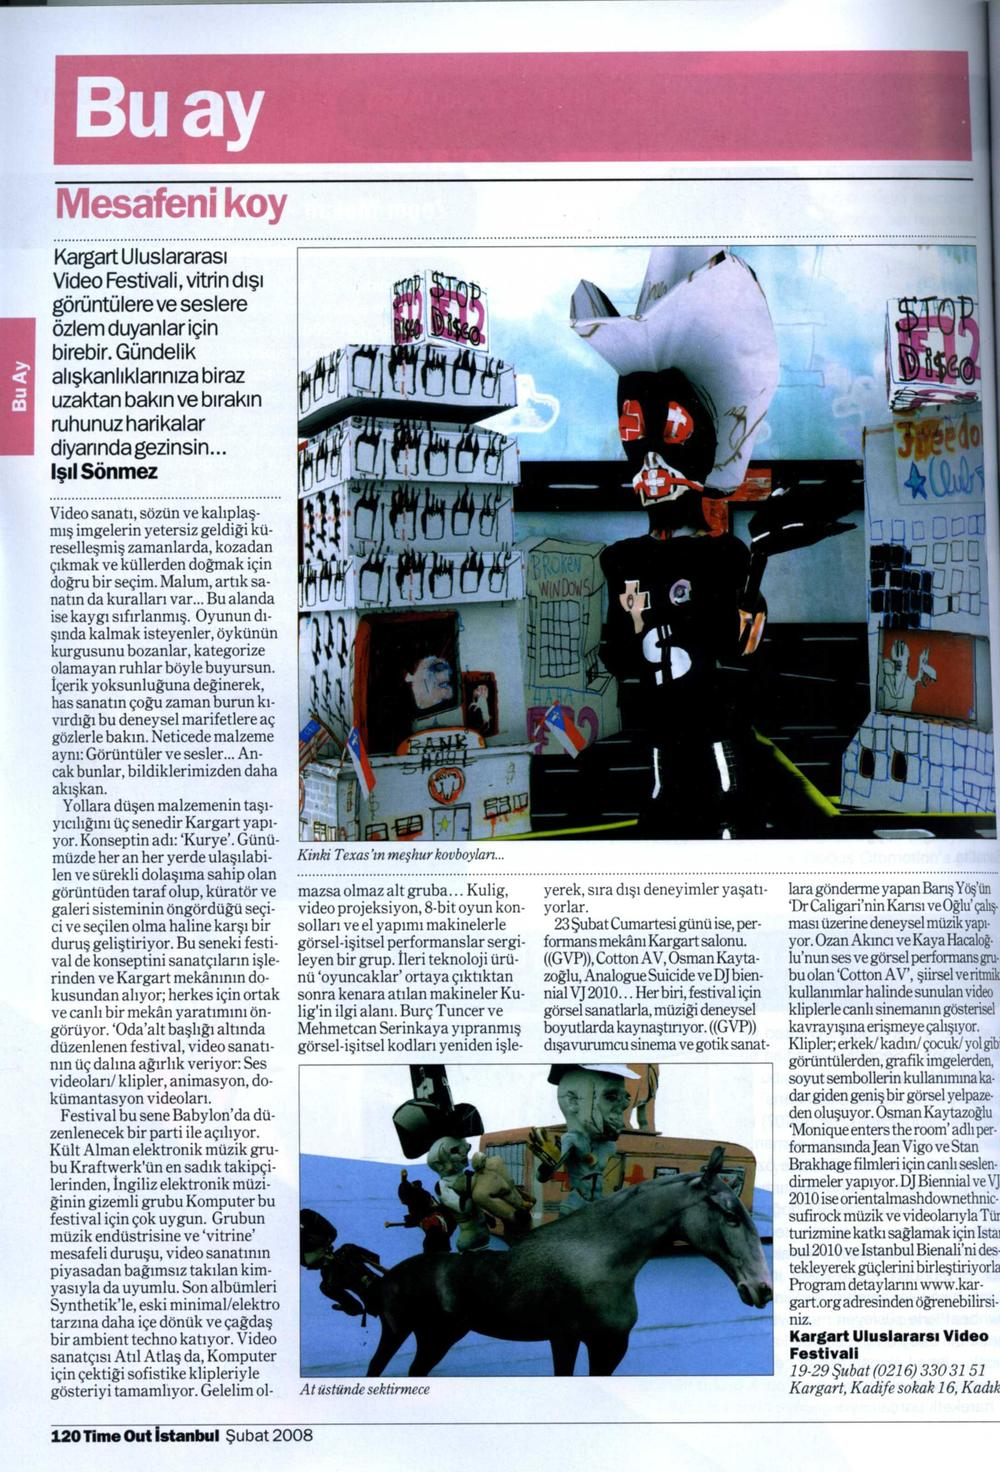 Timeout_Subat'08_haber.JPG